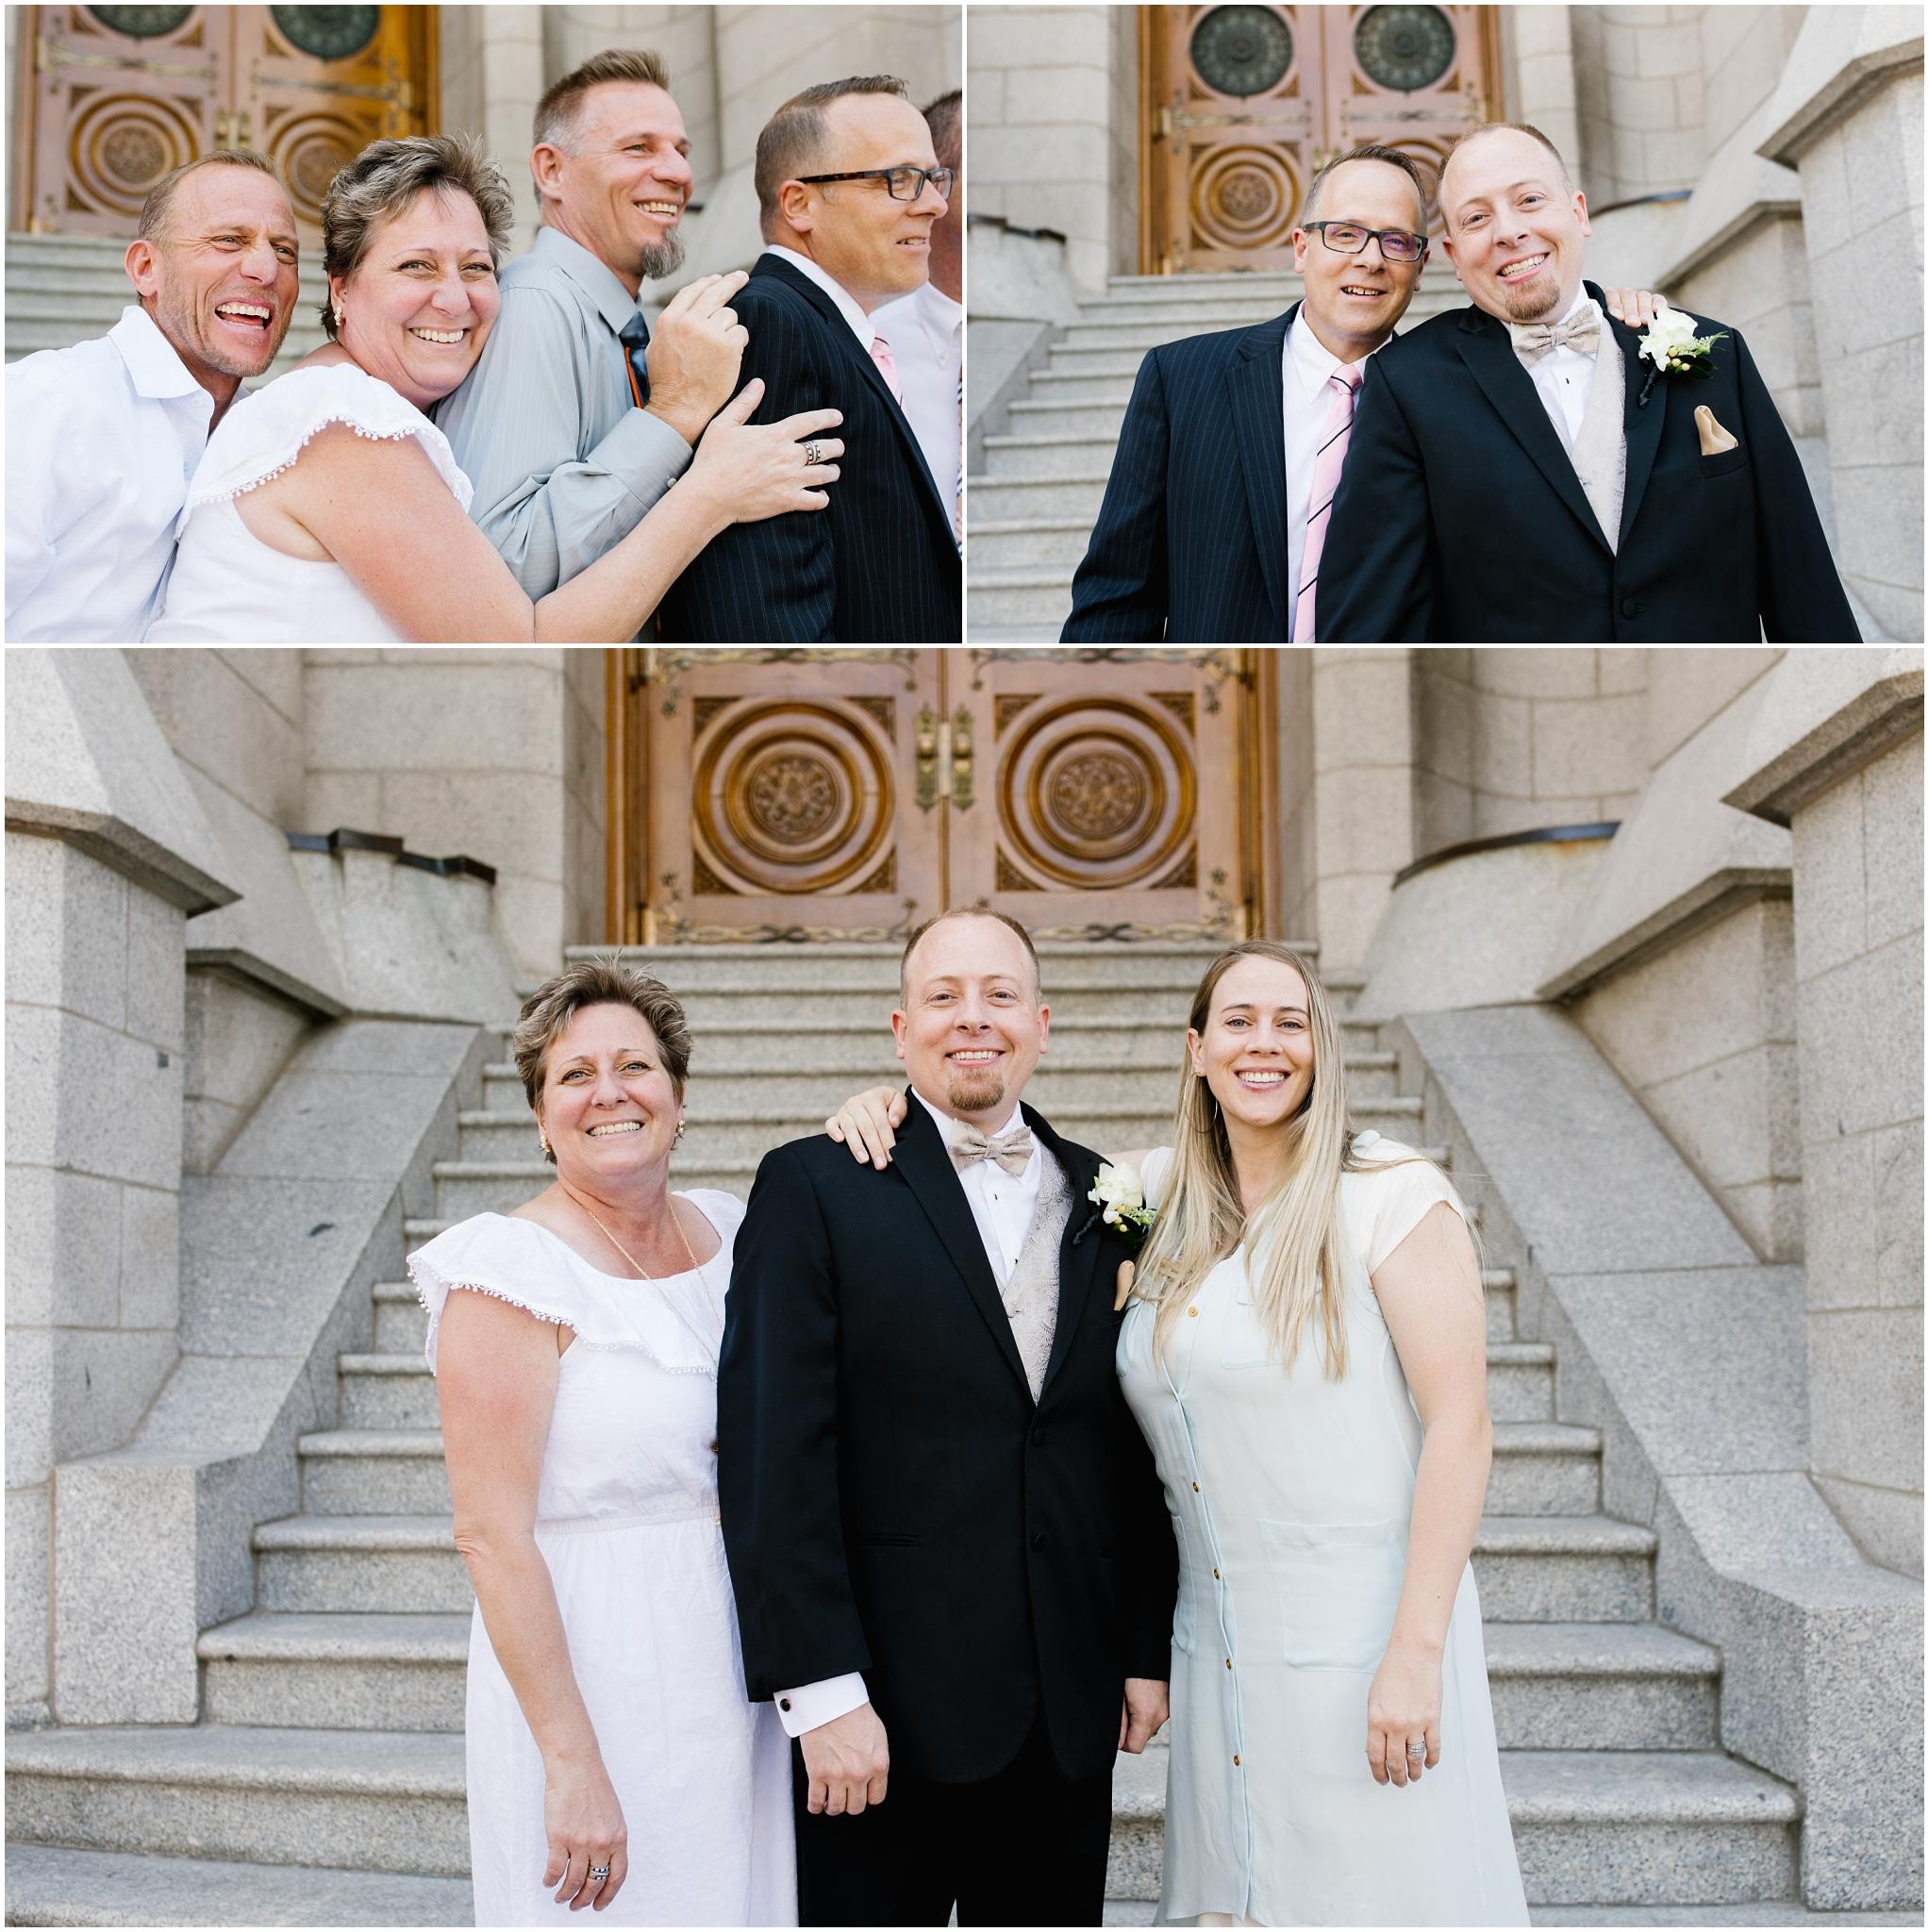 CherylandTyler-56_Lizzie-B-Imagery-Utah-Wedding-Photographer-Salt-Lake-City-Temple-Wells-Fargo-Building-Reception.jpg